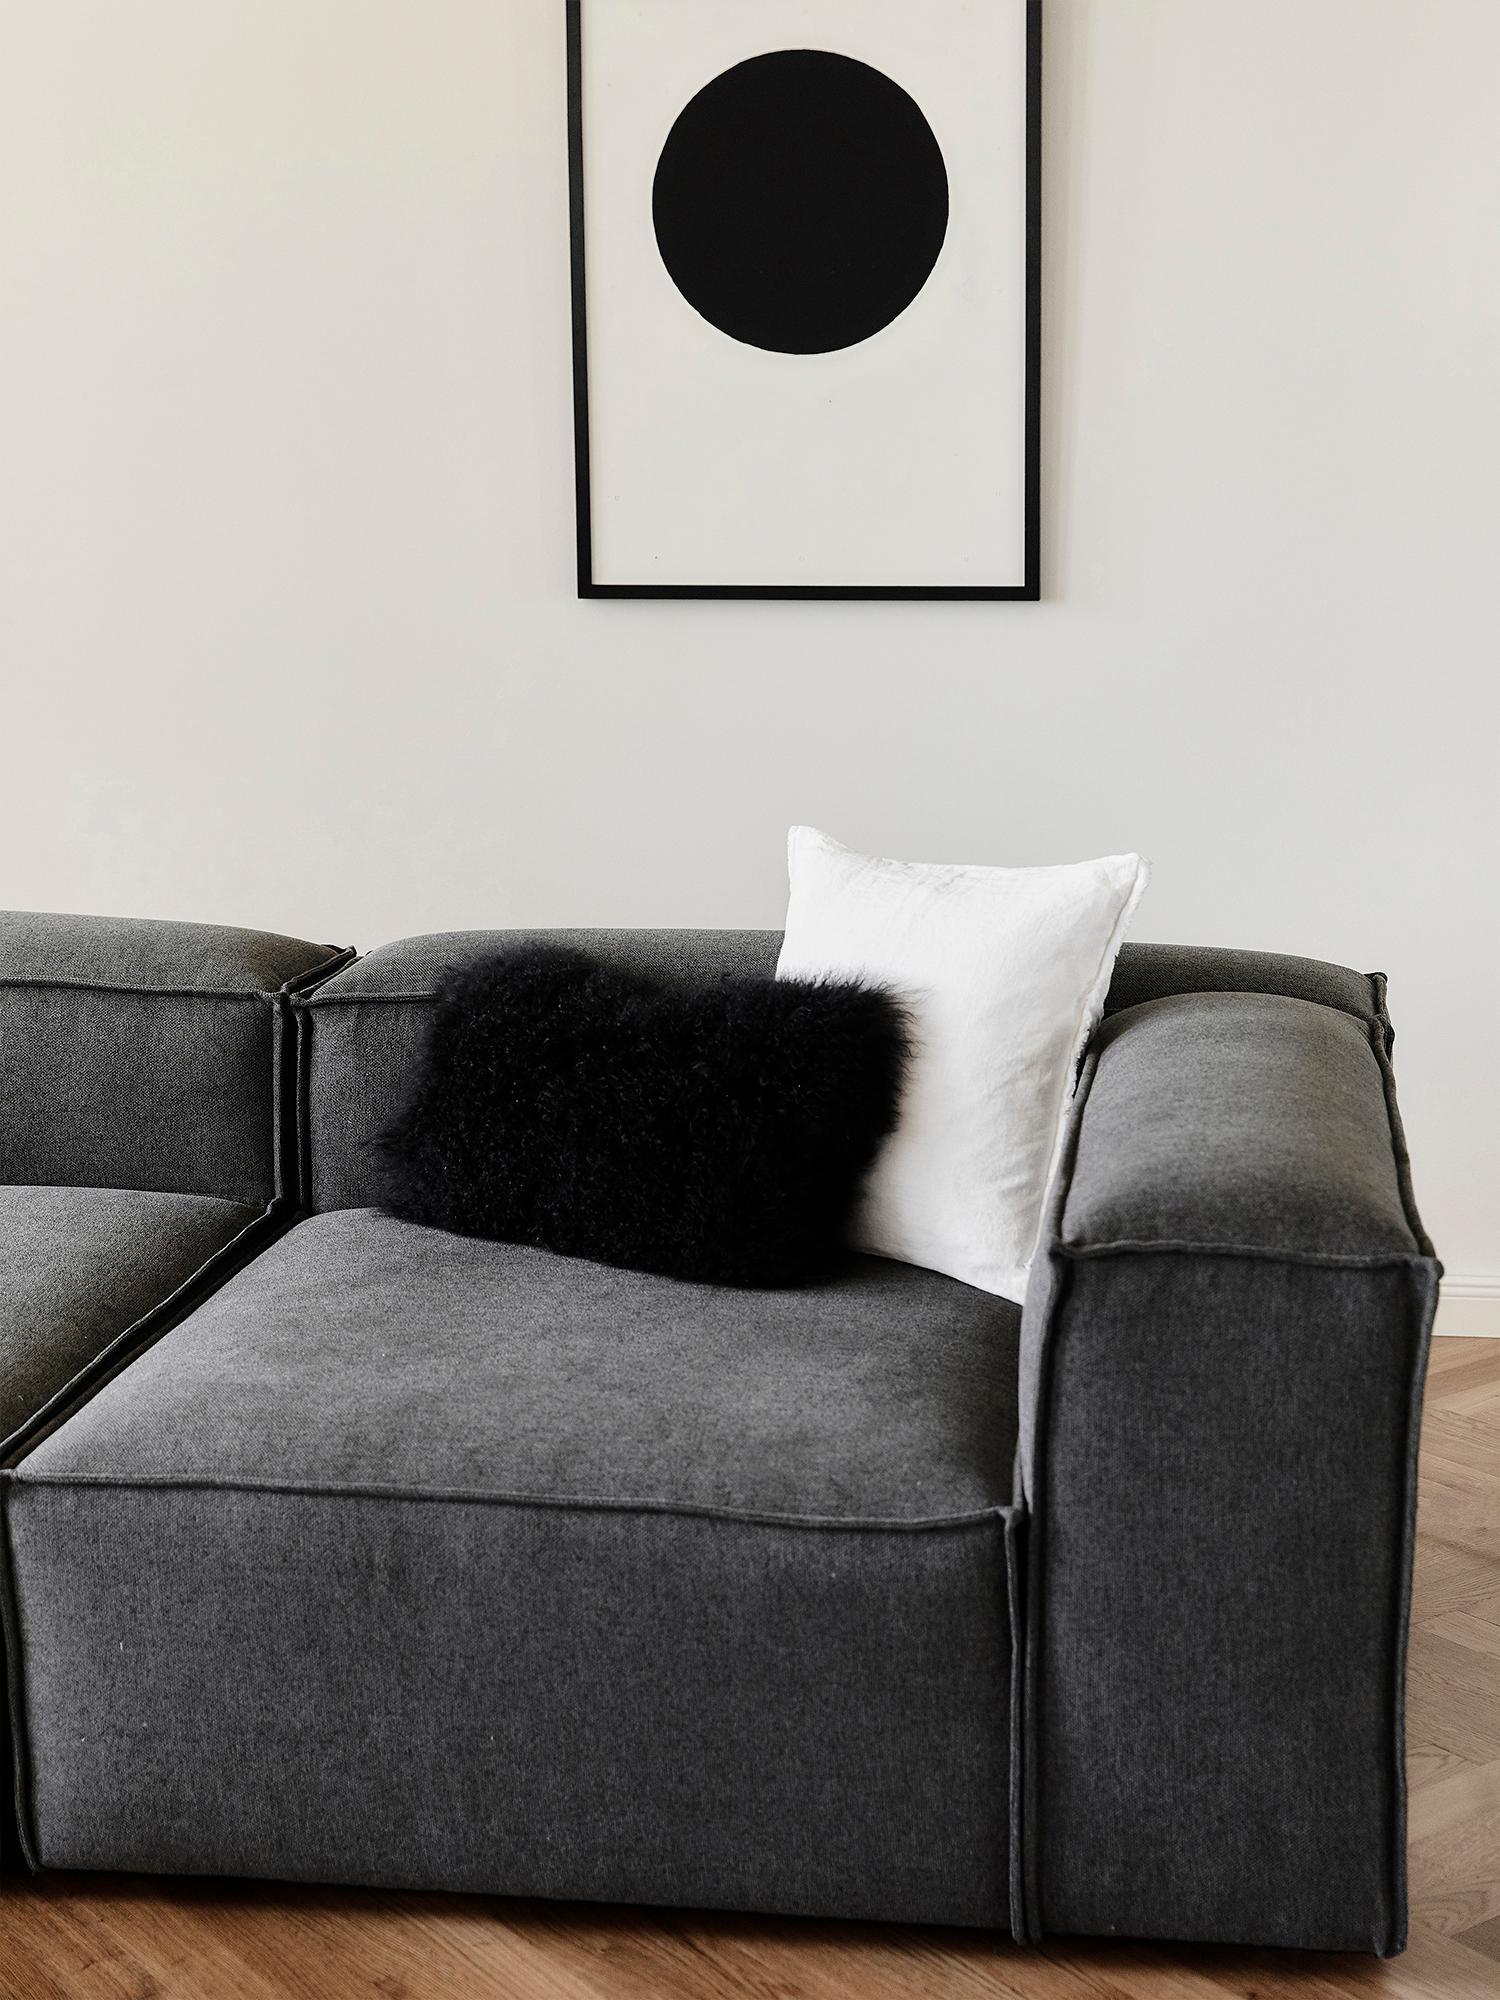 Modulare Ottomane Lennon, Bezug: Polyester 35.000 Scheuert, Gestell: Massives Kiefernholz, Spe, Füße: Kunststoff, Webstoff Anthrazit, B 269 x T 119 cm